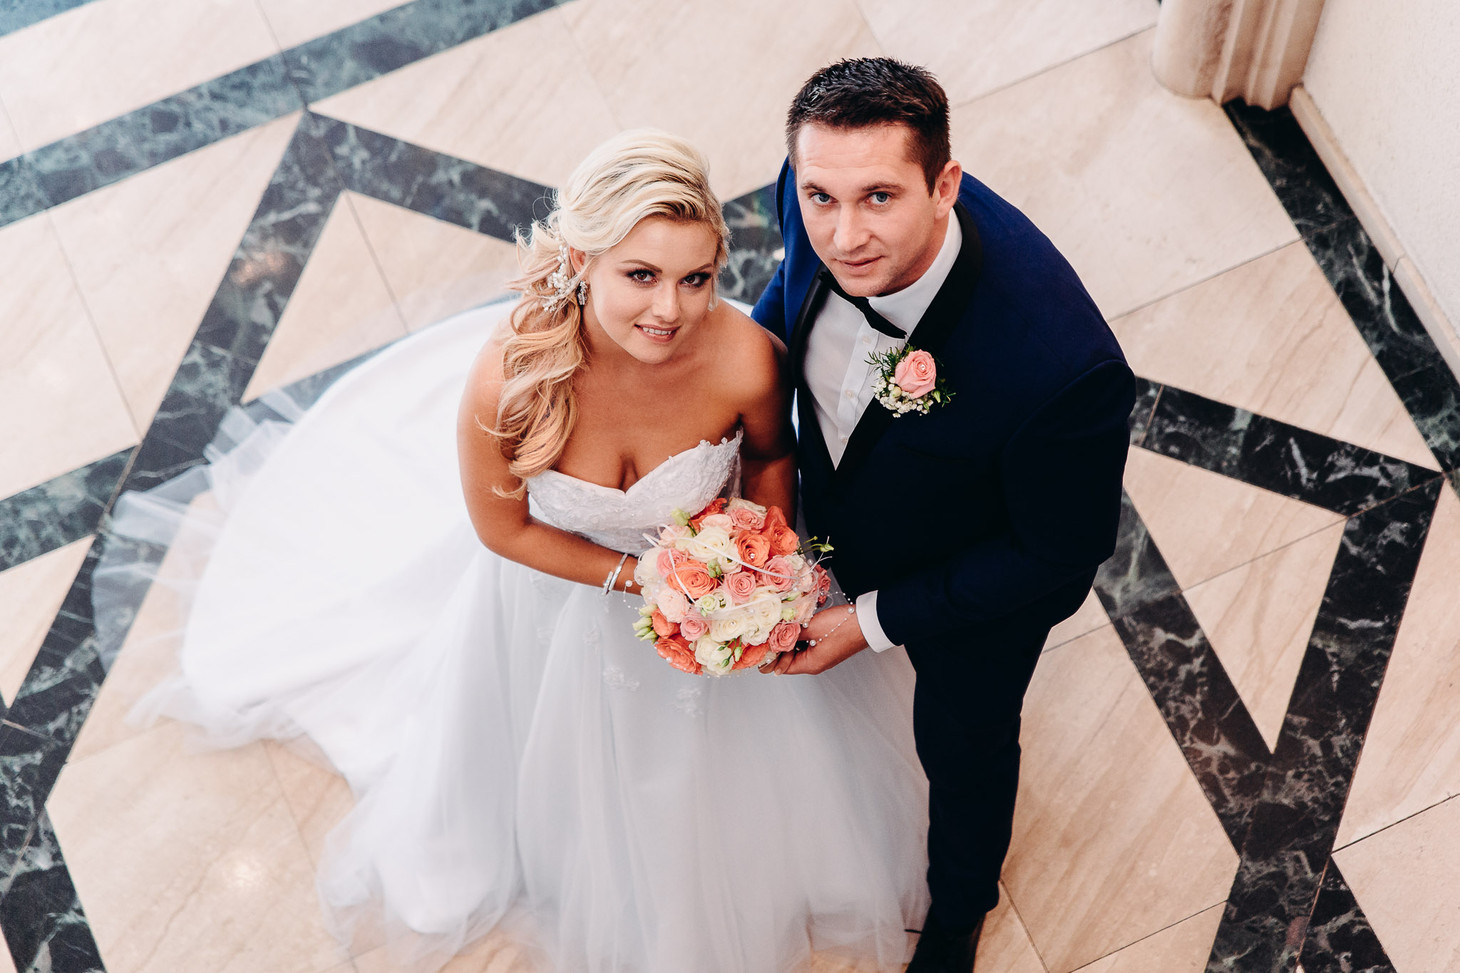 Brautpaar Traumpaar Hochzeitsshooting